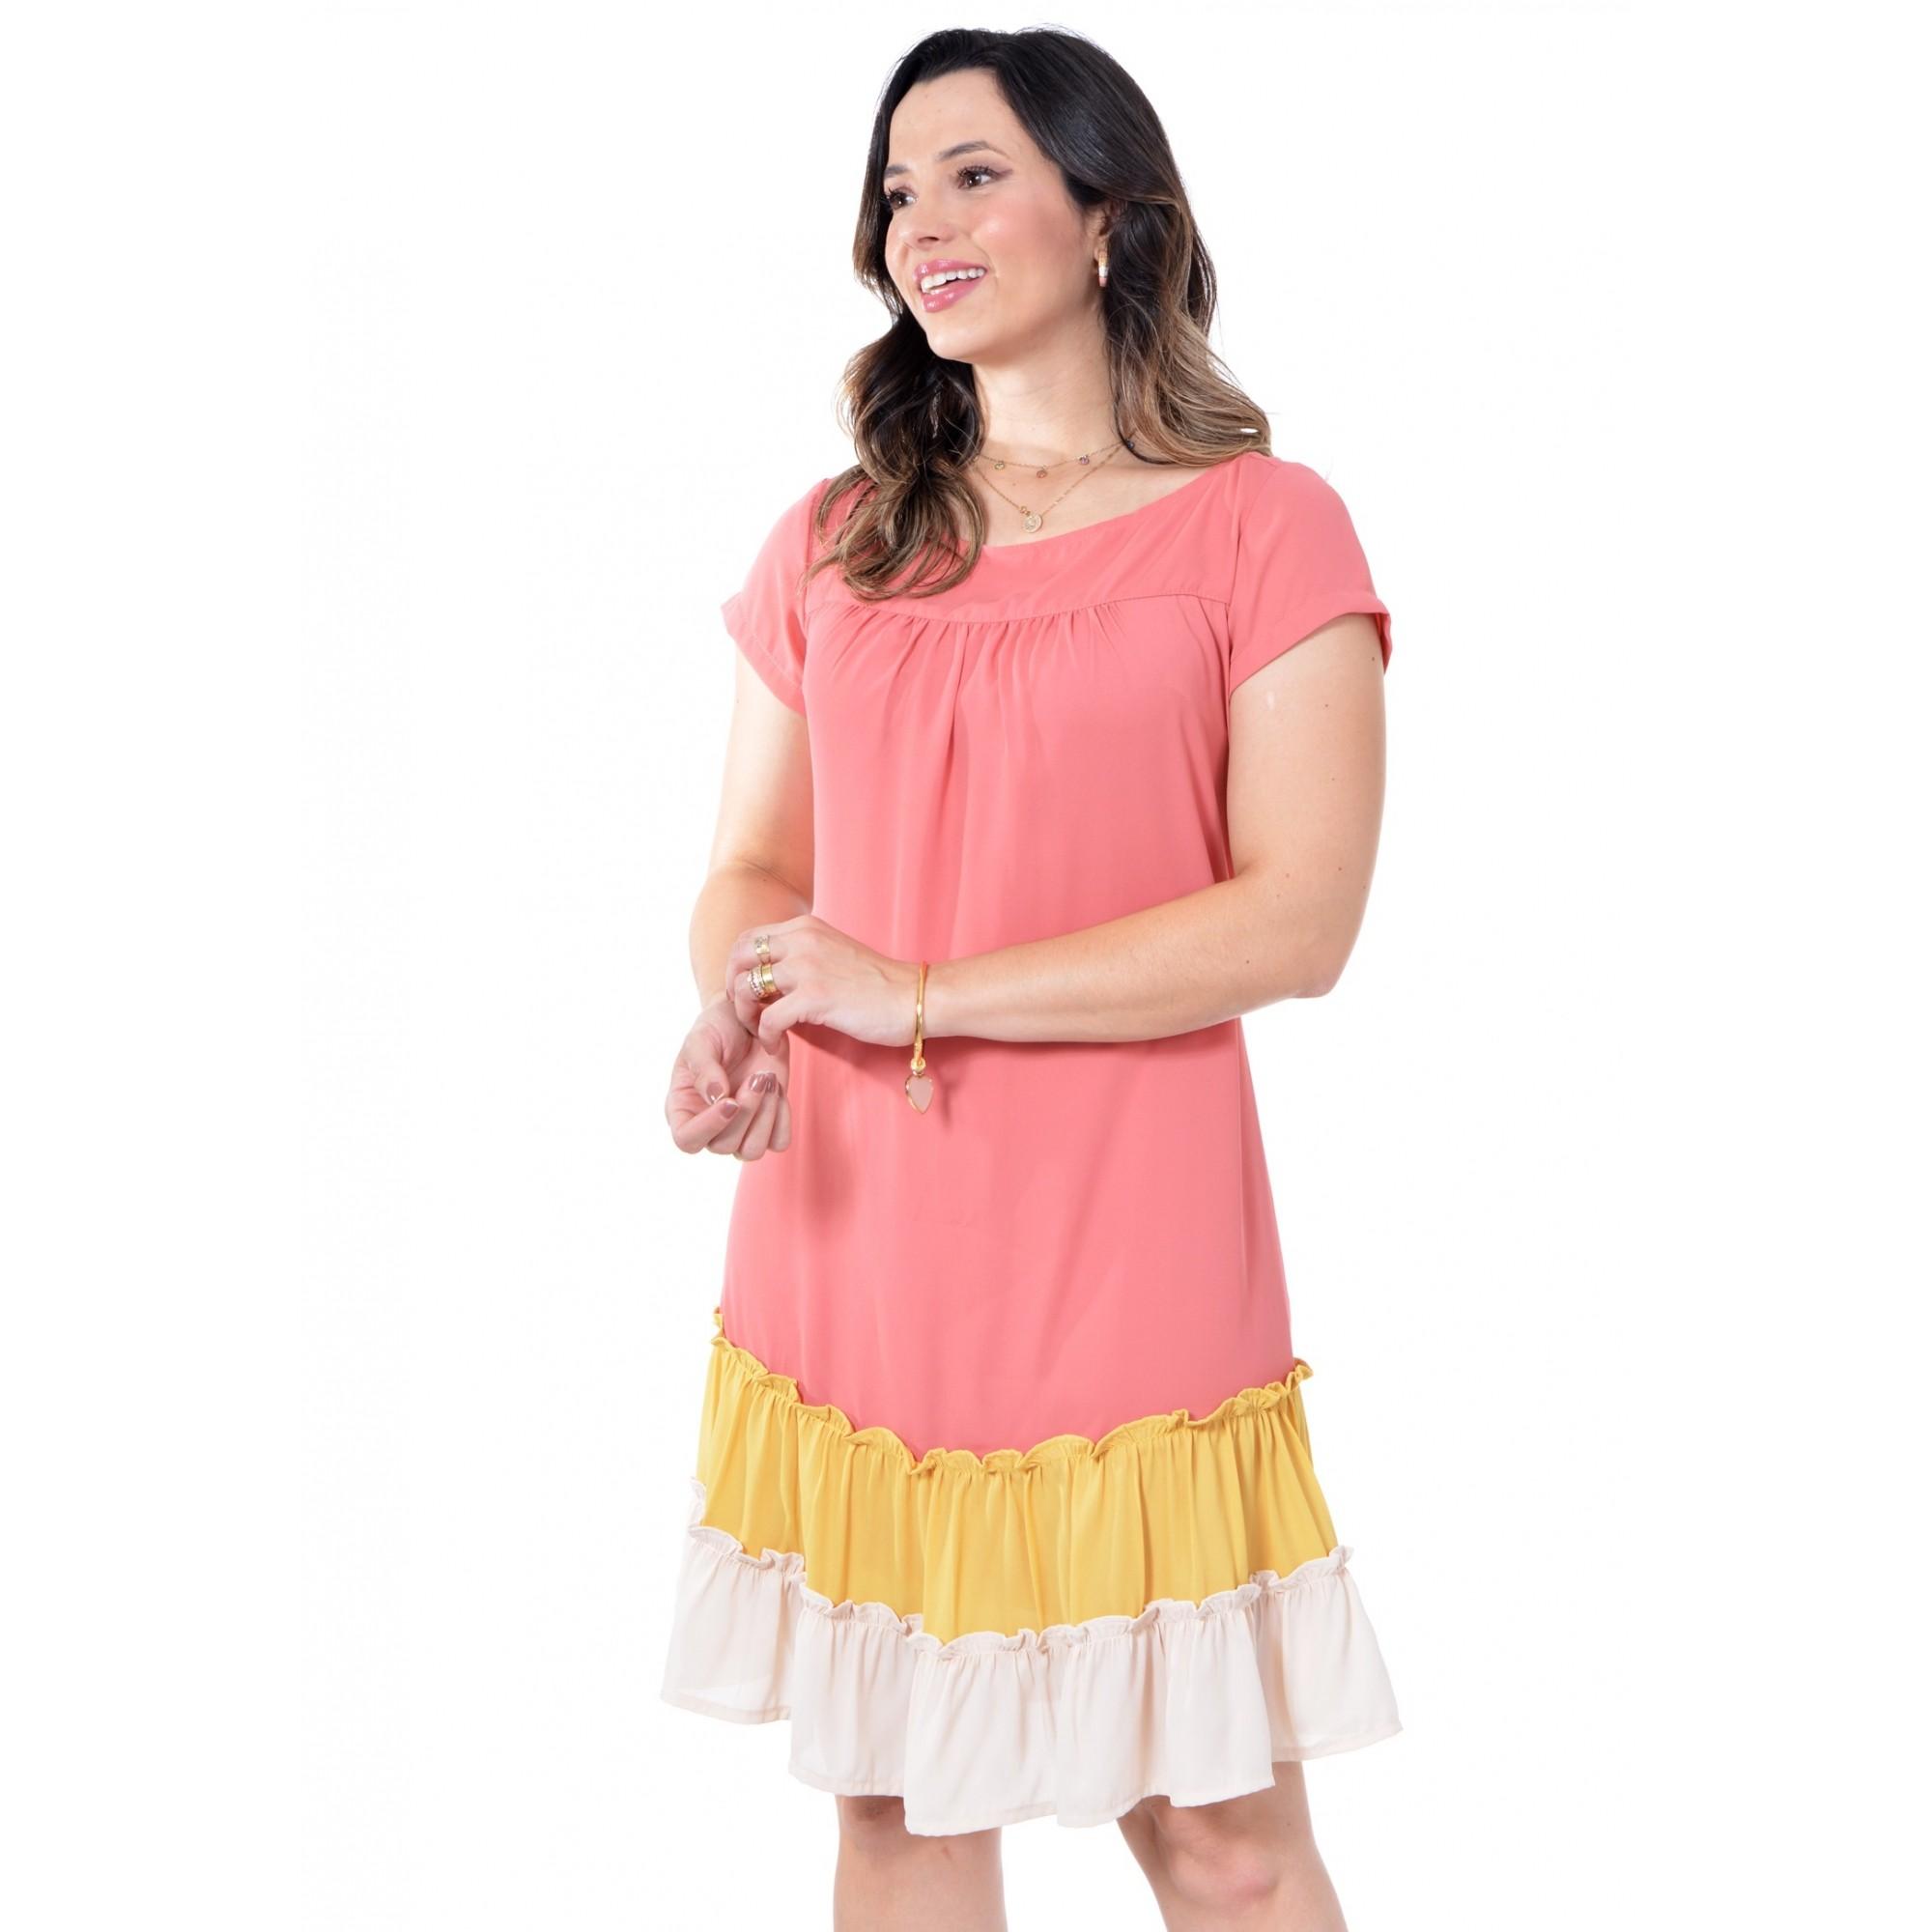 Vestido em crepe tricolor